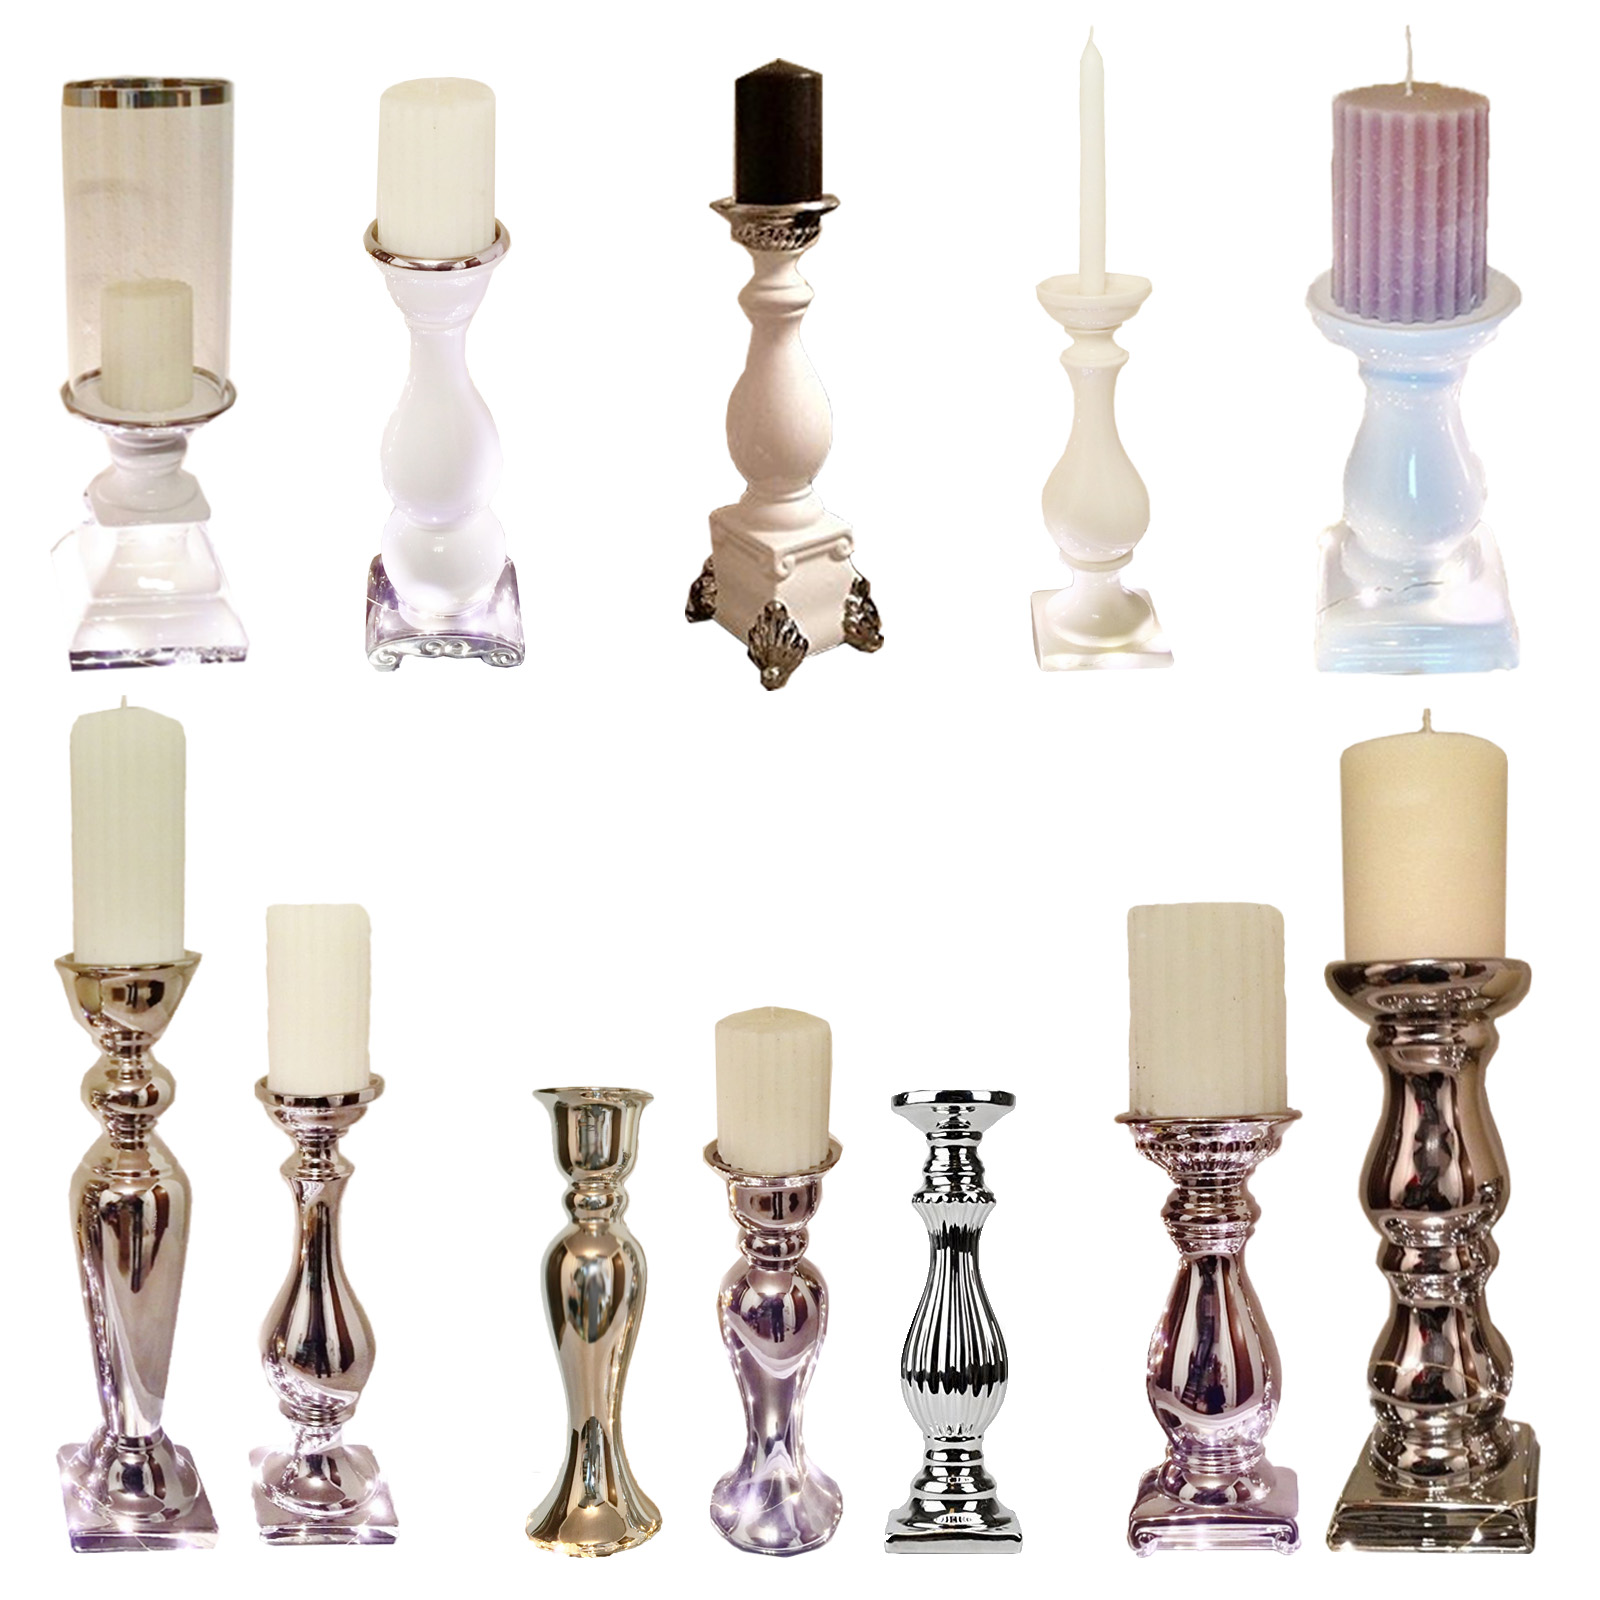 keramik kerzenleuchter kerzenst nder silber wei windlicht kerzenhalter st nder ebay. Black Bedroom Furniture Sets. Home Design Ideas